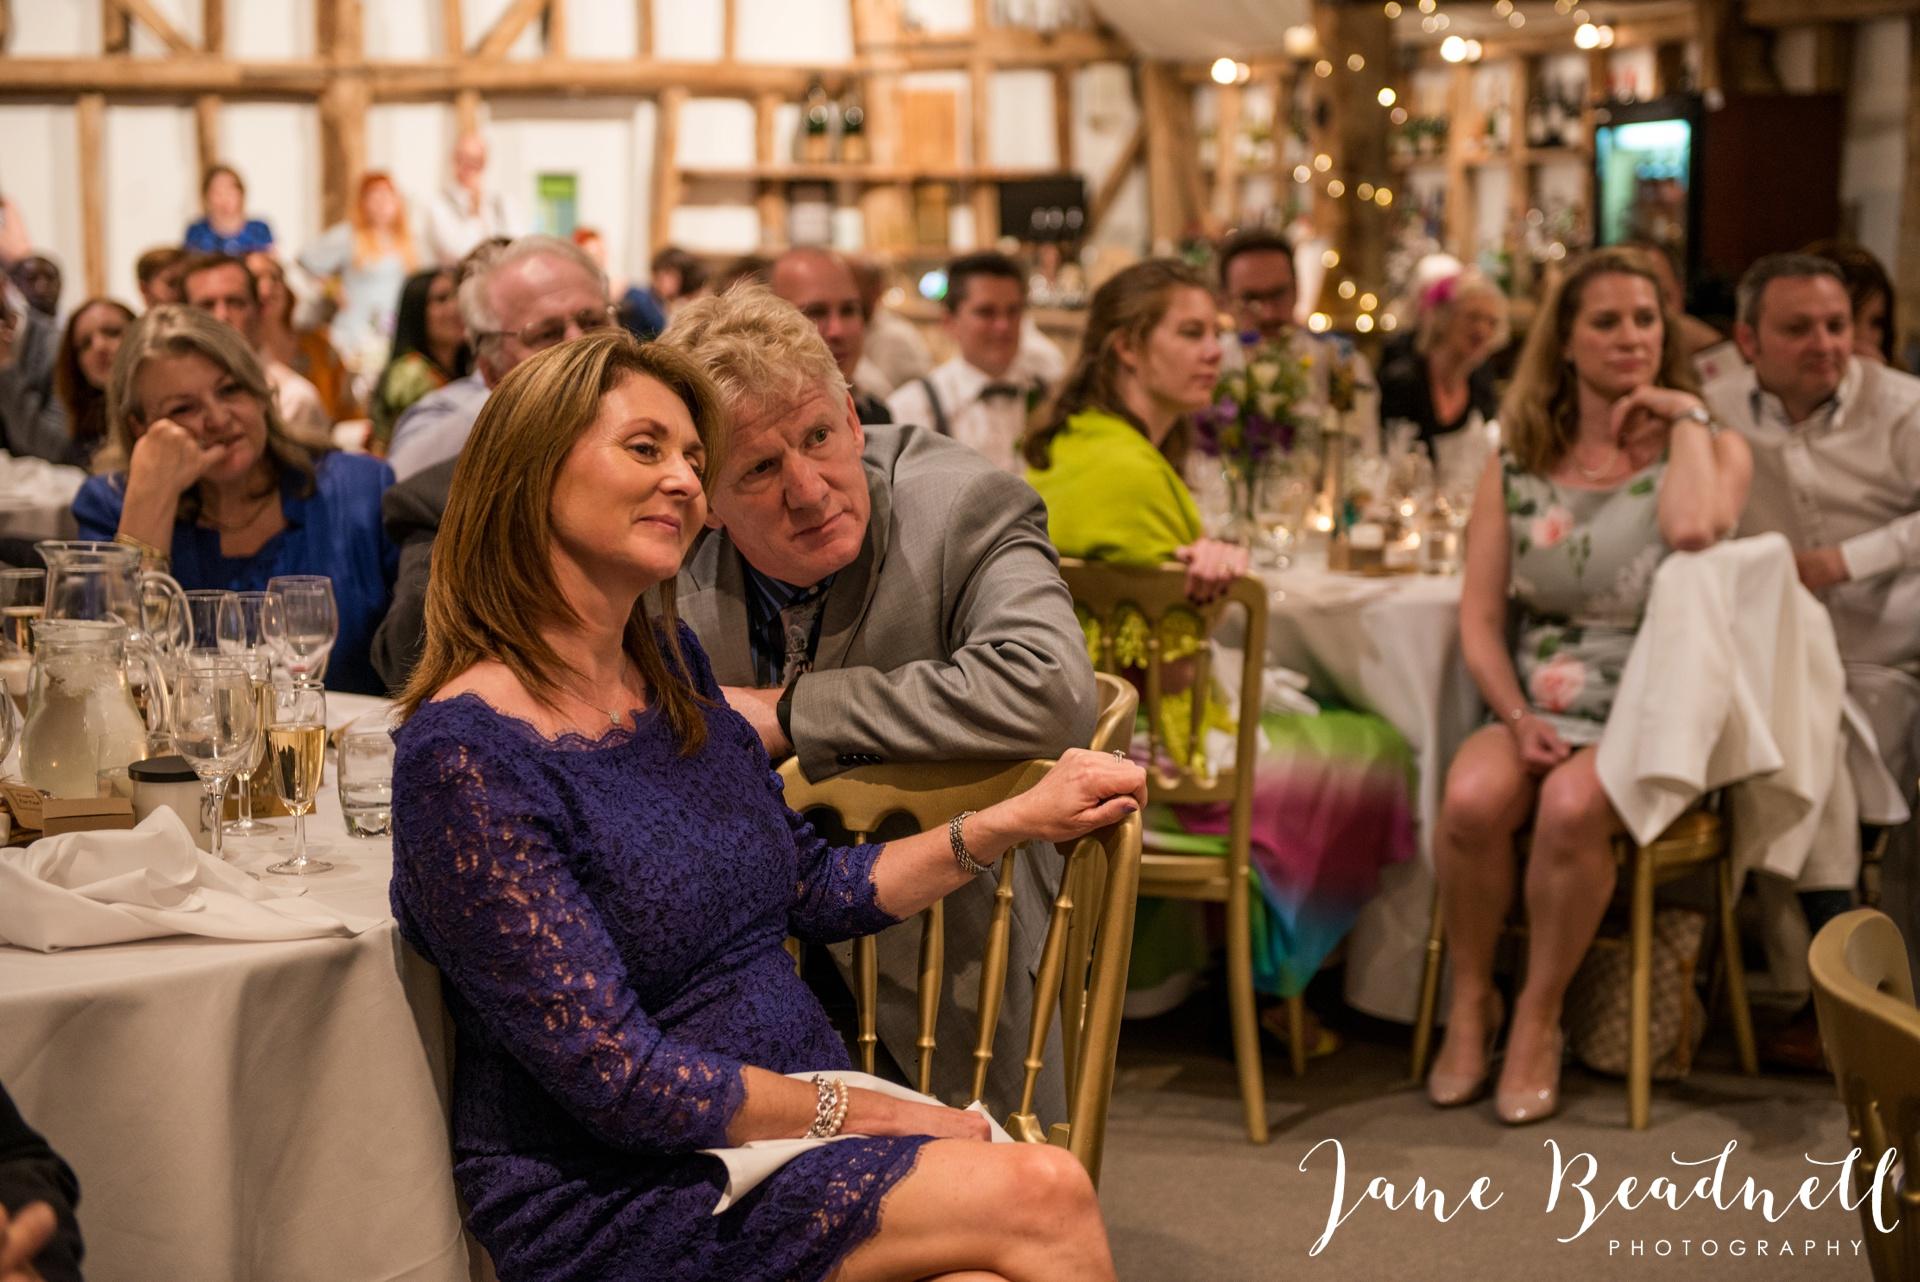 South Farm Wedding photography Hertfordshire by Jane Beadnell Photography fine art wedding photographer_0210